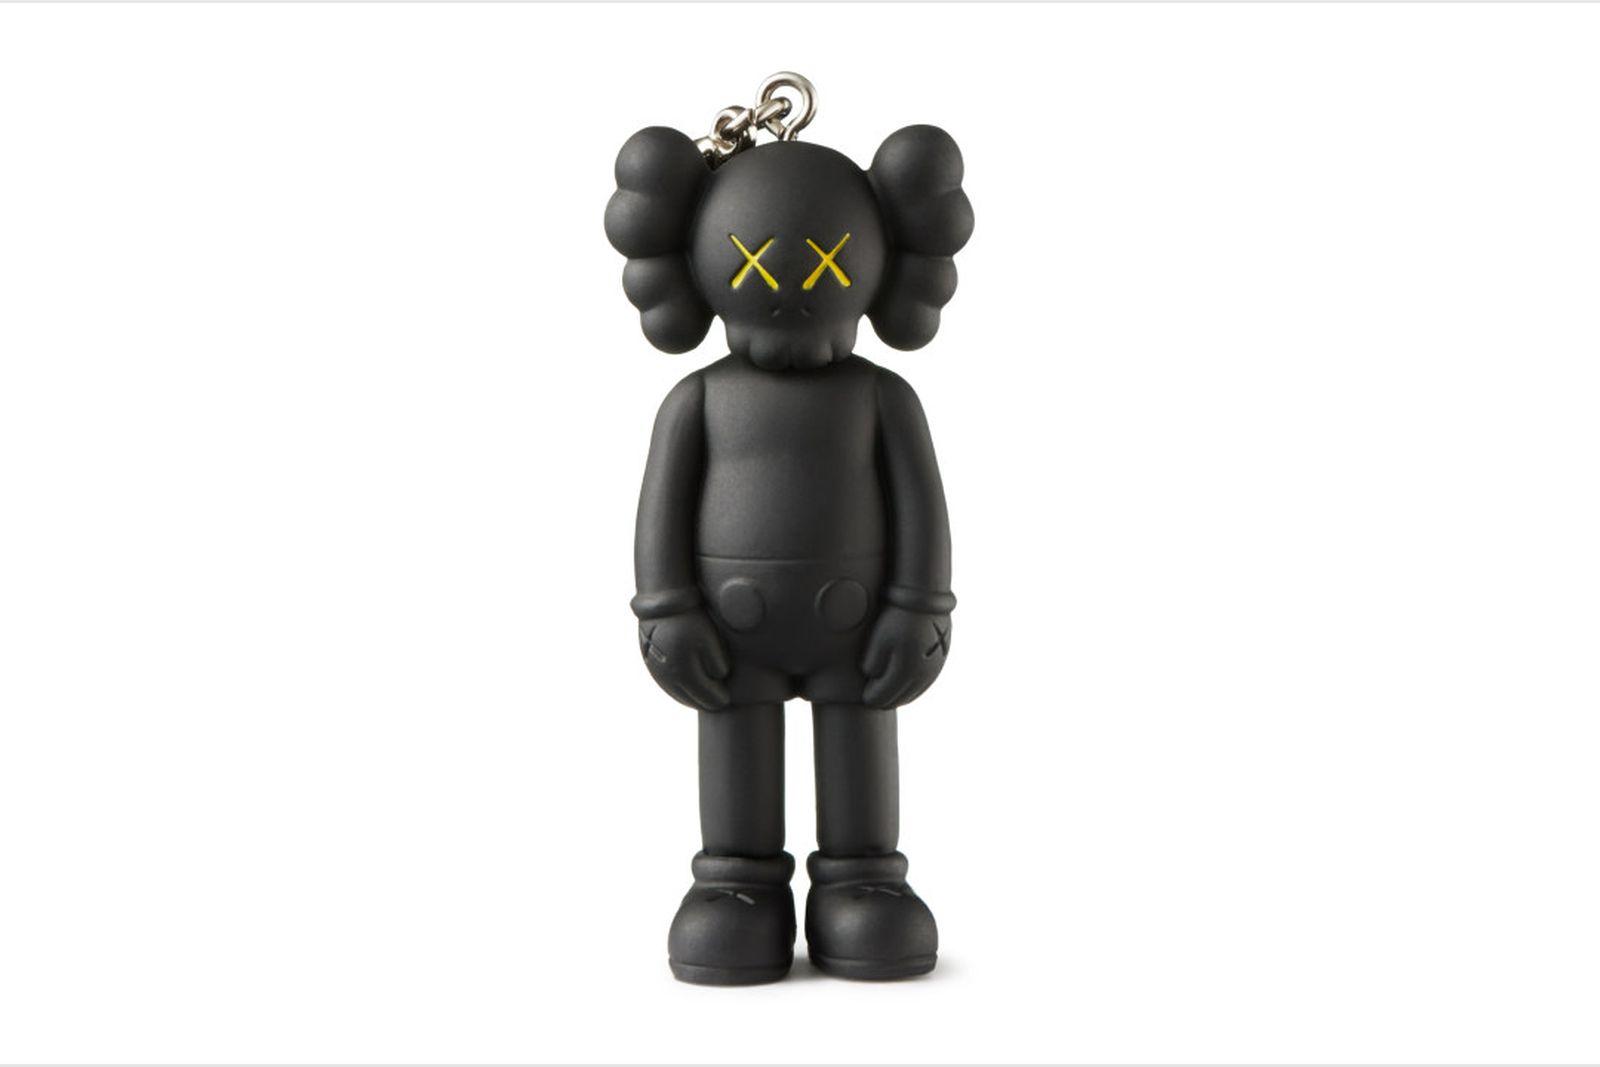 kaws tokyo first exhibit medicom toy figure keyholder chain companion